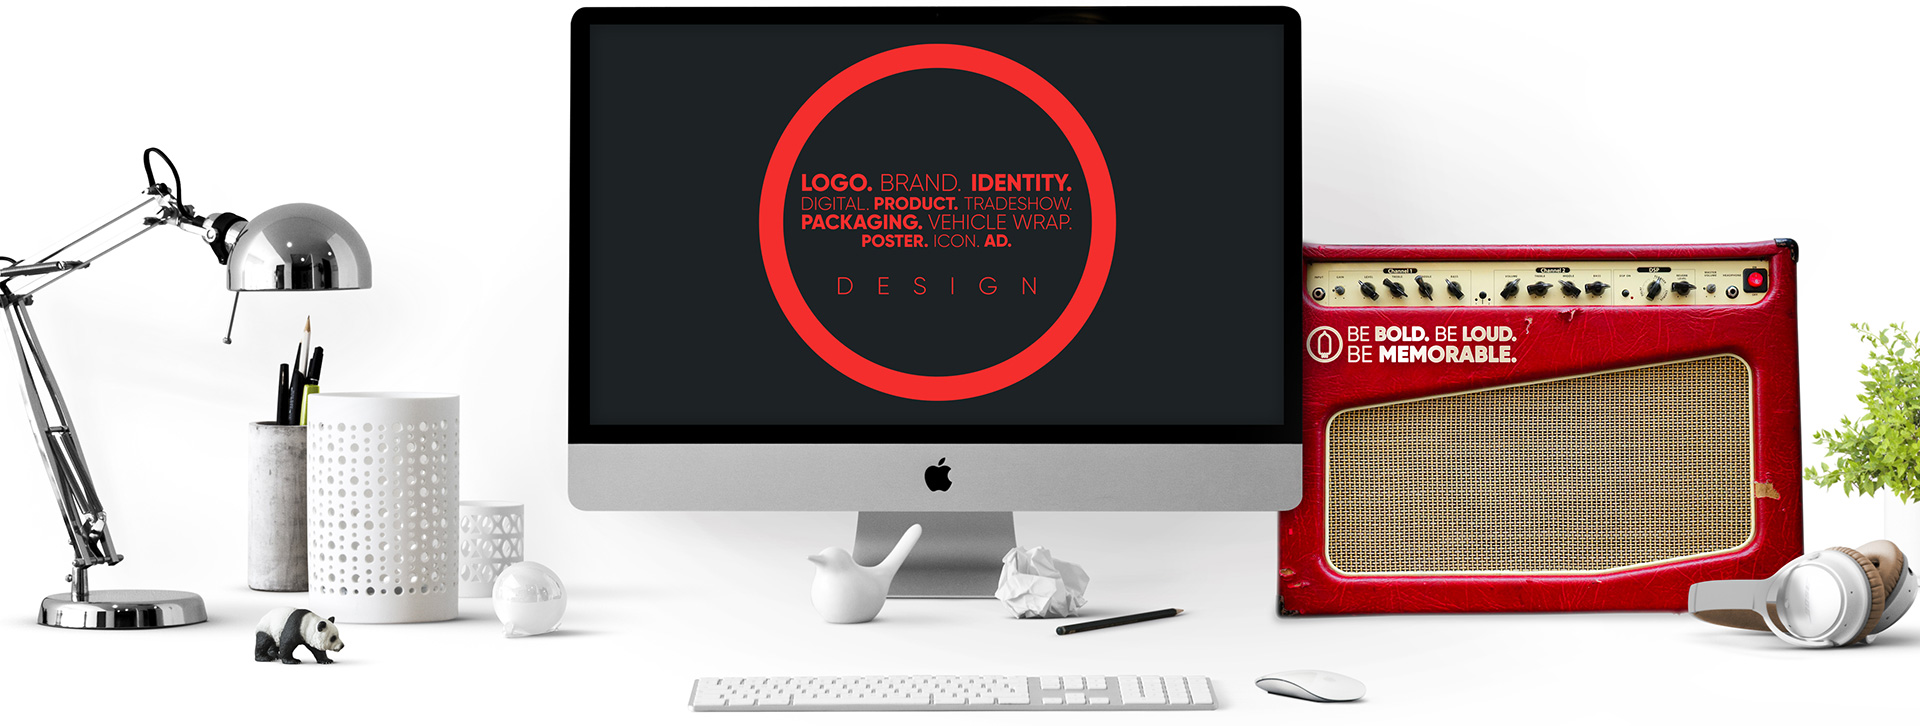 Amplified Design | Graphic Design, Logo Design, Brand Design